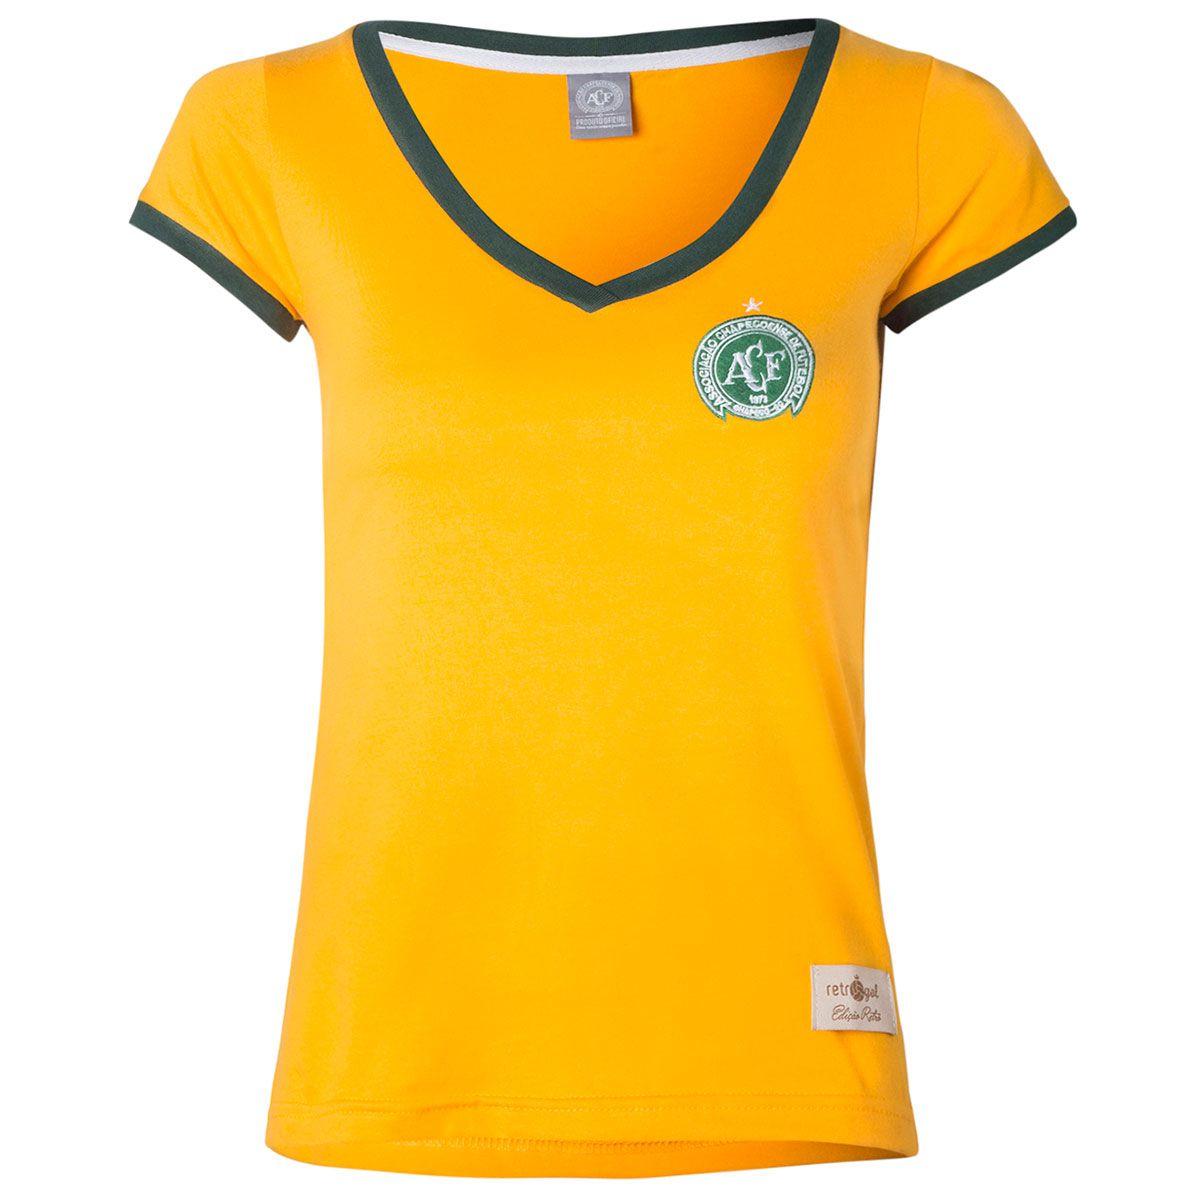 Camisa Feminina Baby Look Retrô Gol Chapecoense Seleção Brasil Torcedor